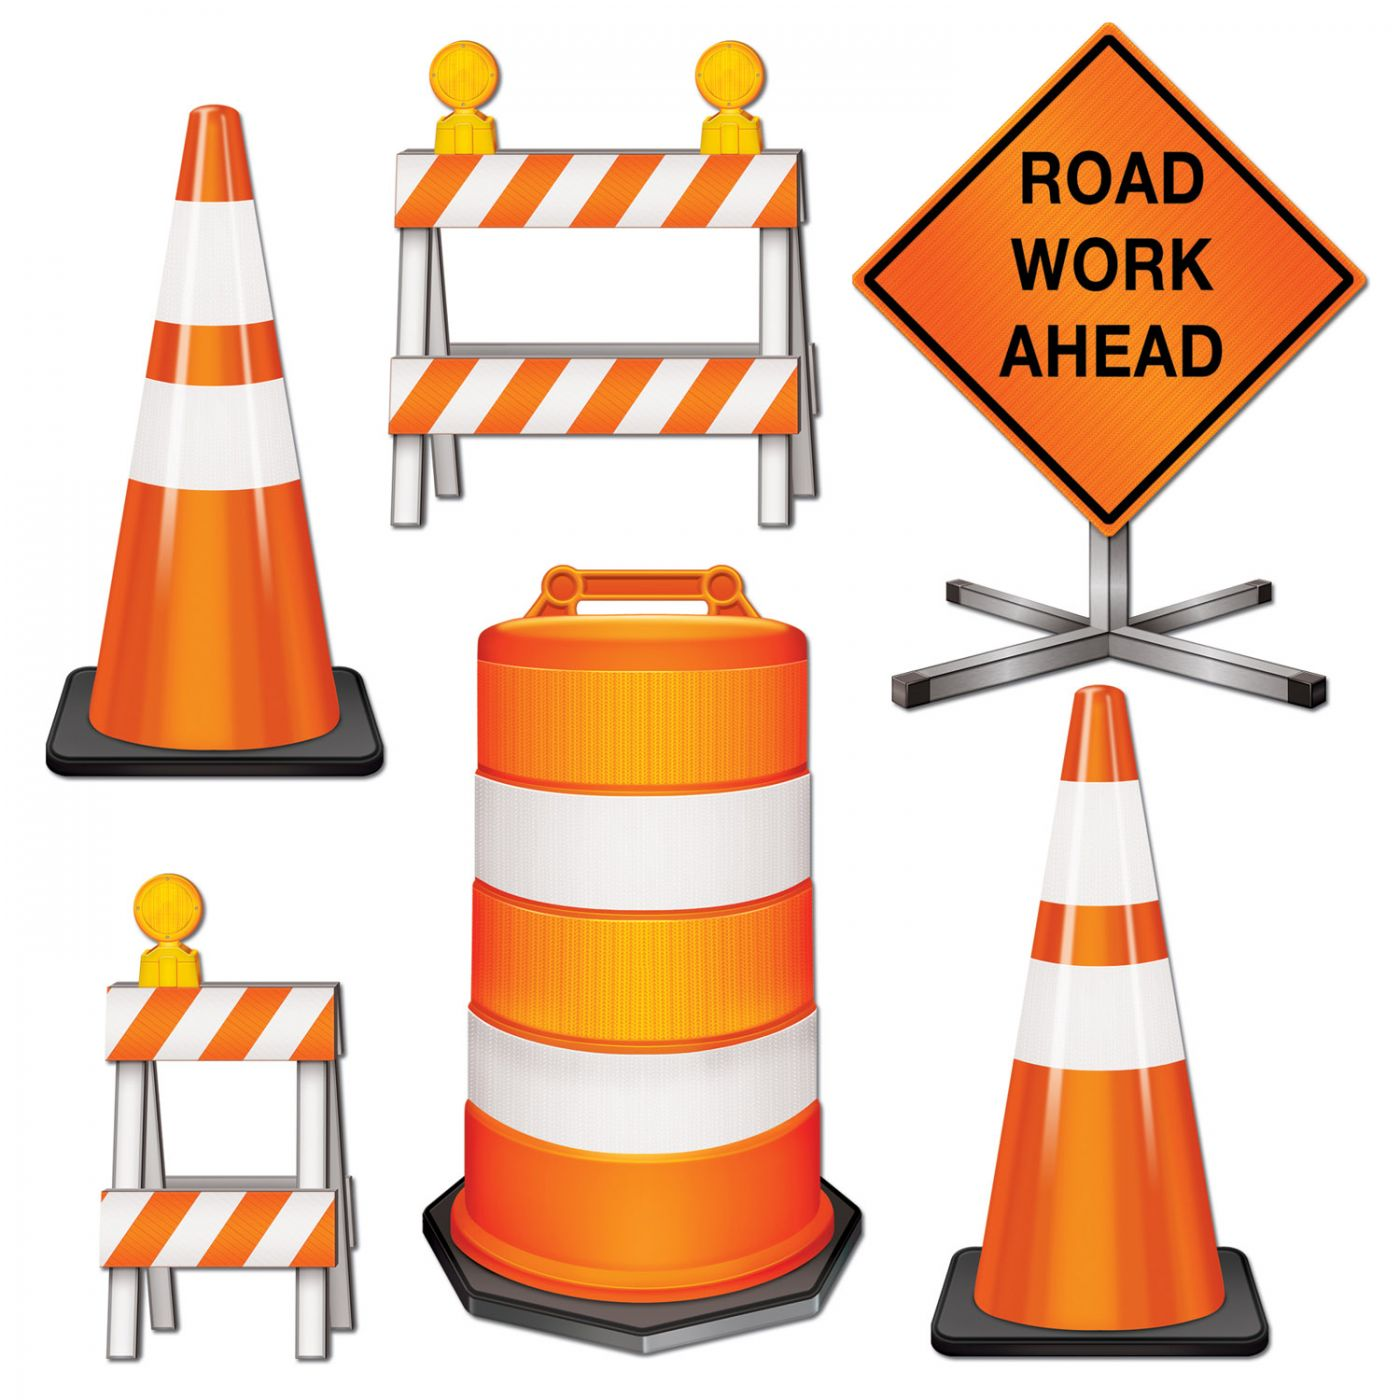 Road Crew Cutouts image